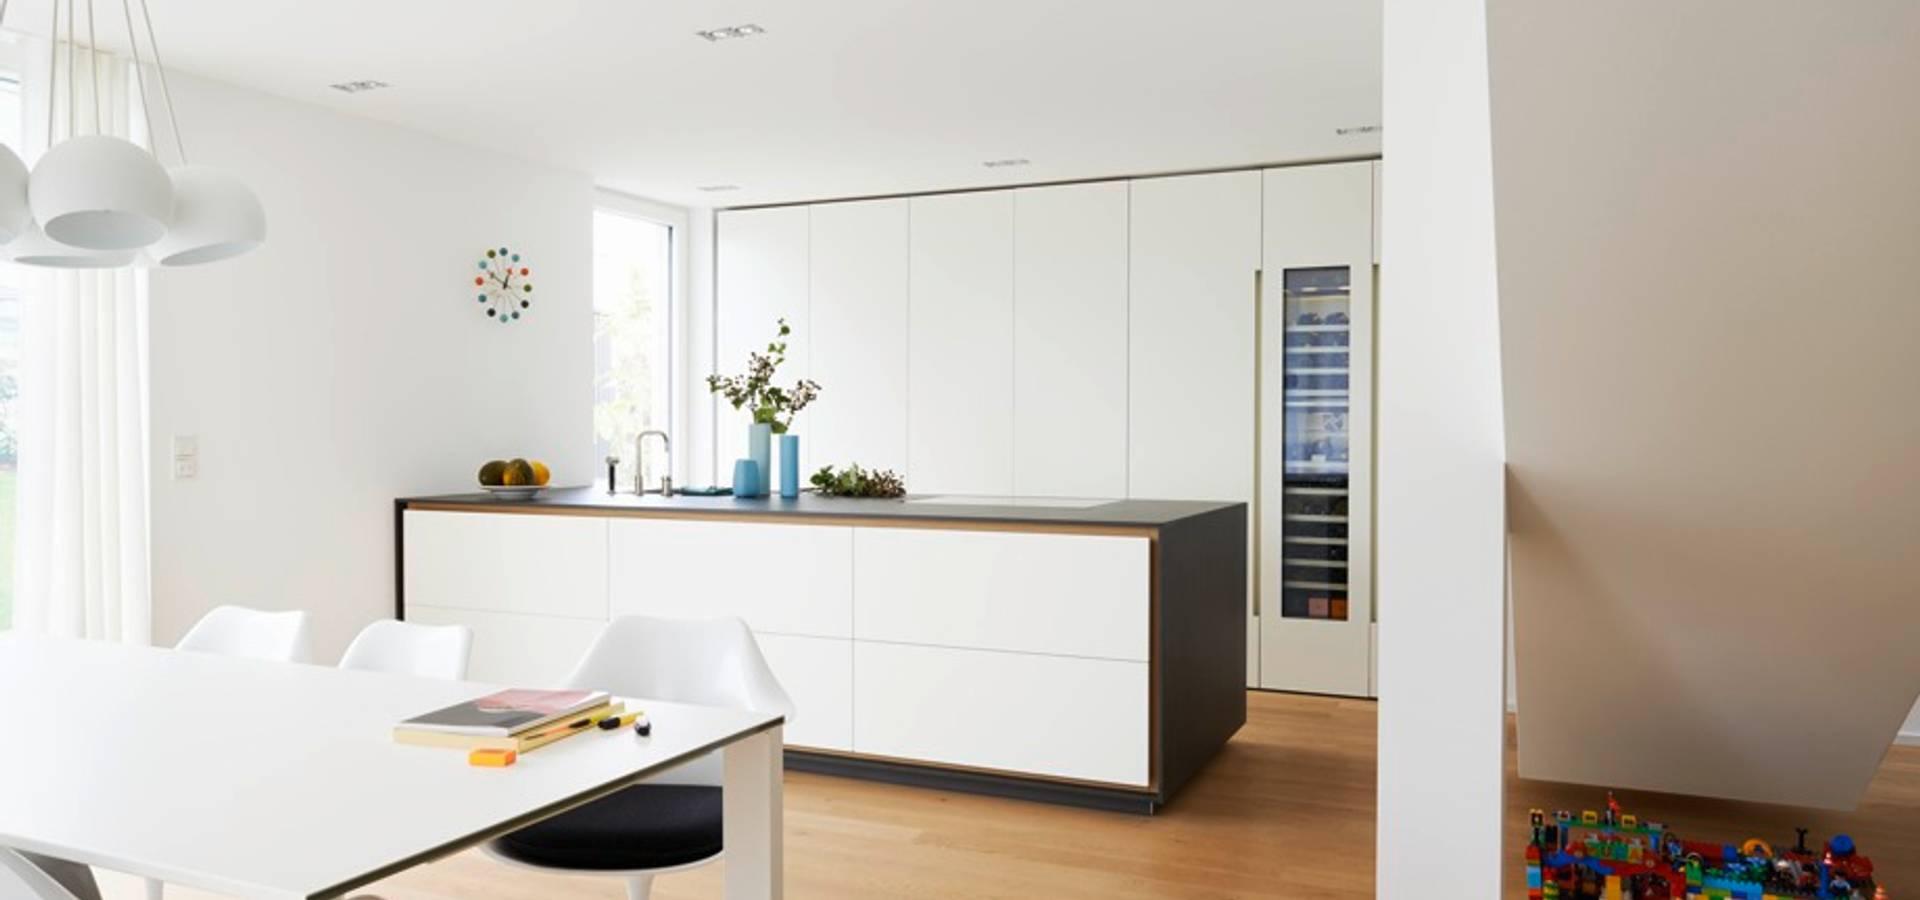 eggersmann k che von la cucina in schweinfurt de la cucina k chenspezialist gmbh co kg homify. Black Bedroom Furniture Sets. Home Design Ideas